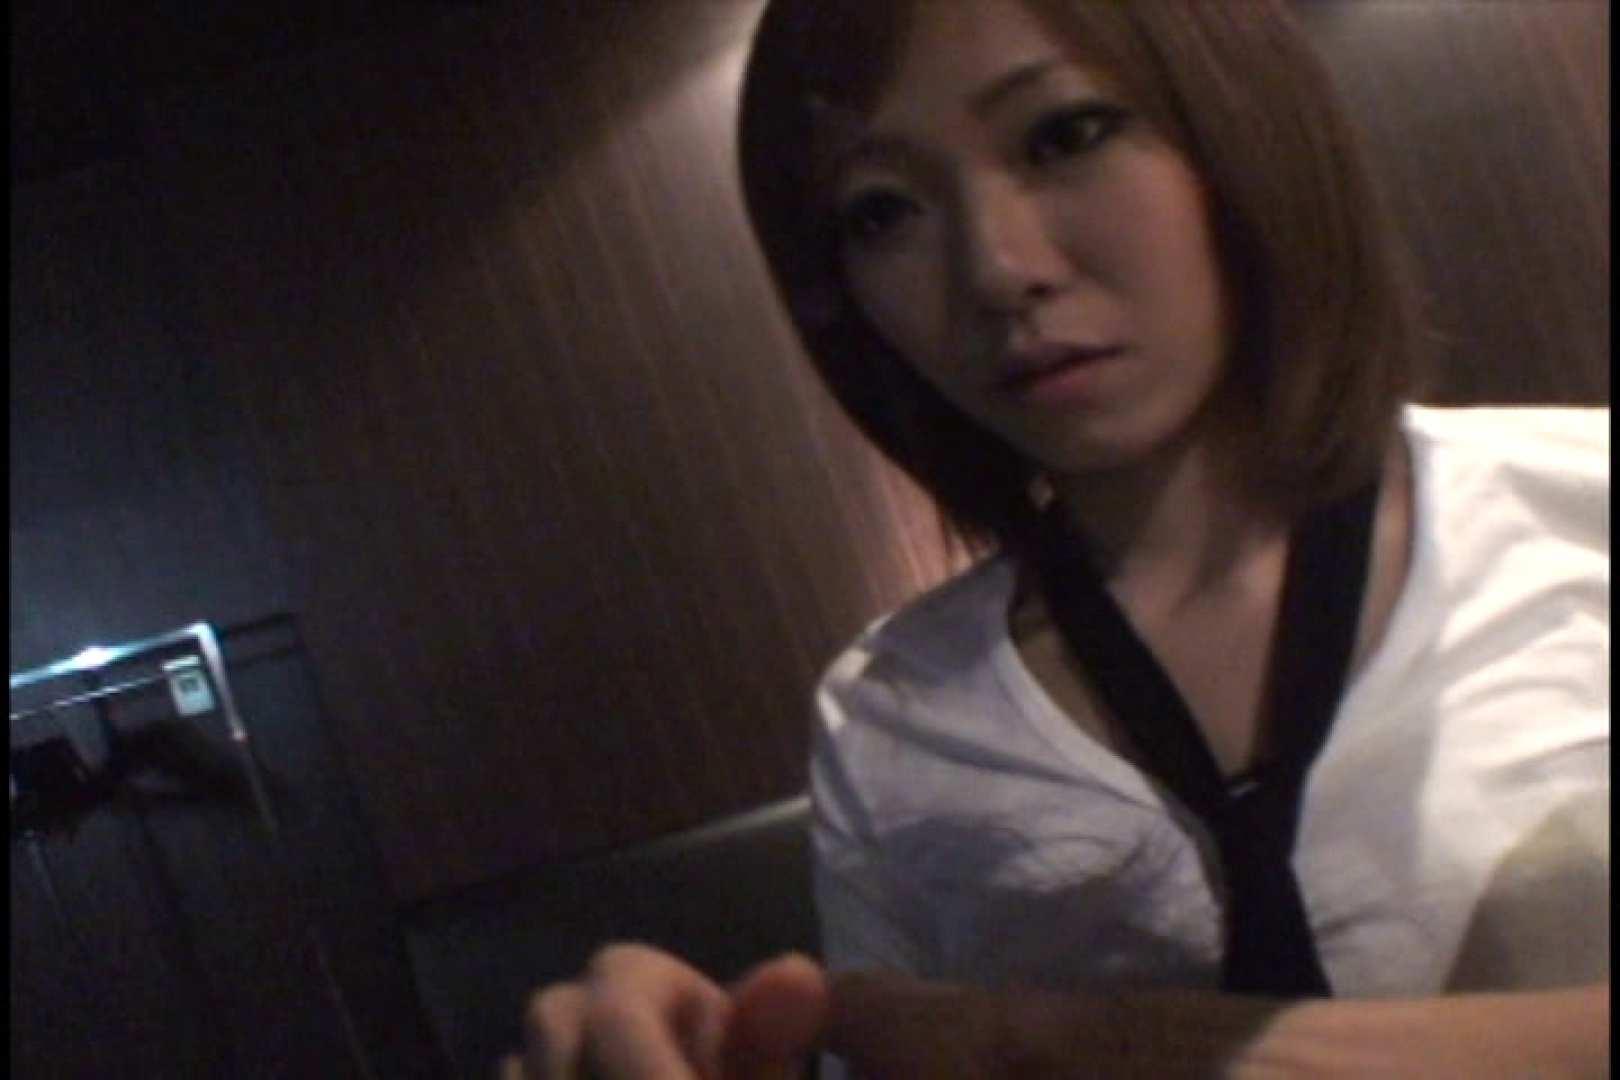 JDハンター全国ツアー vol.036 前編 女子大生のエロ動画 | 0  85PIX 37